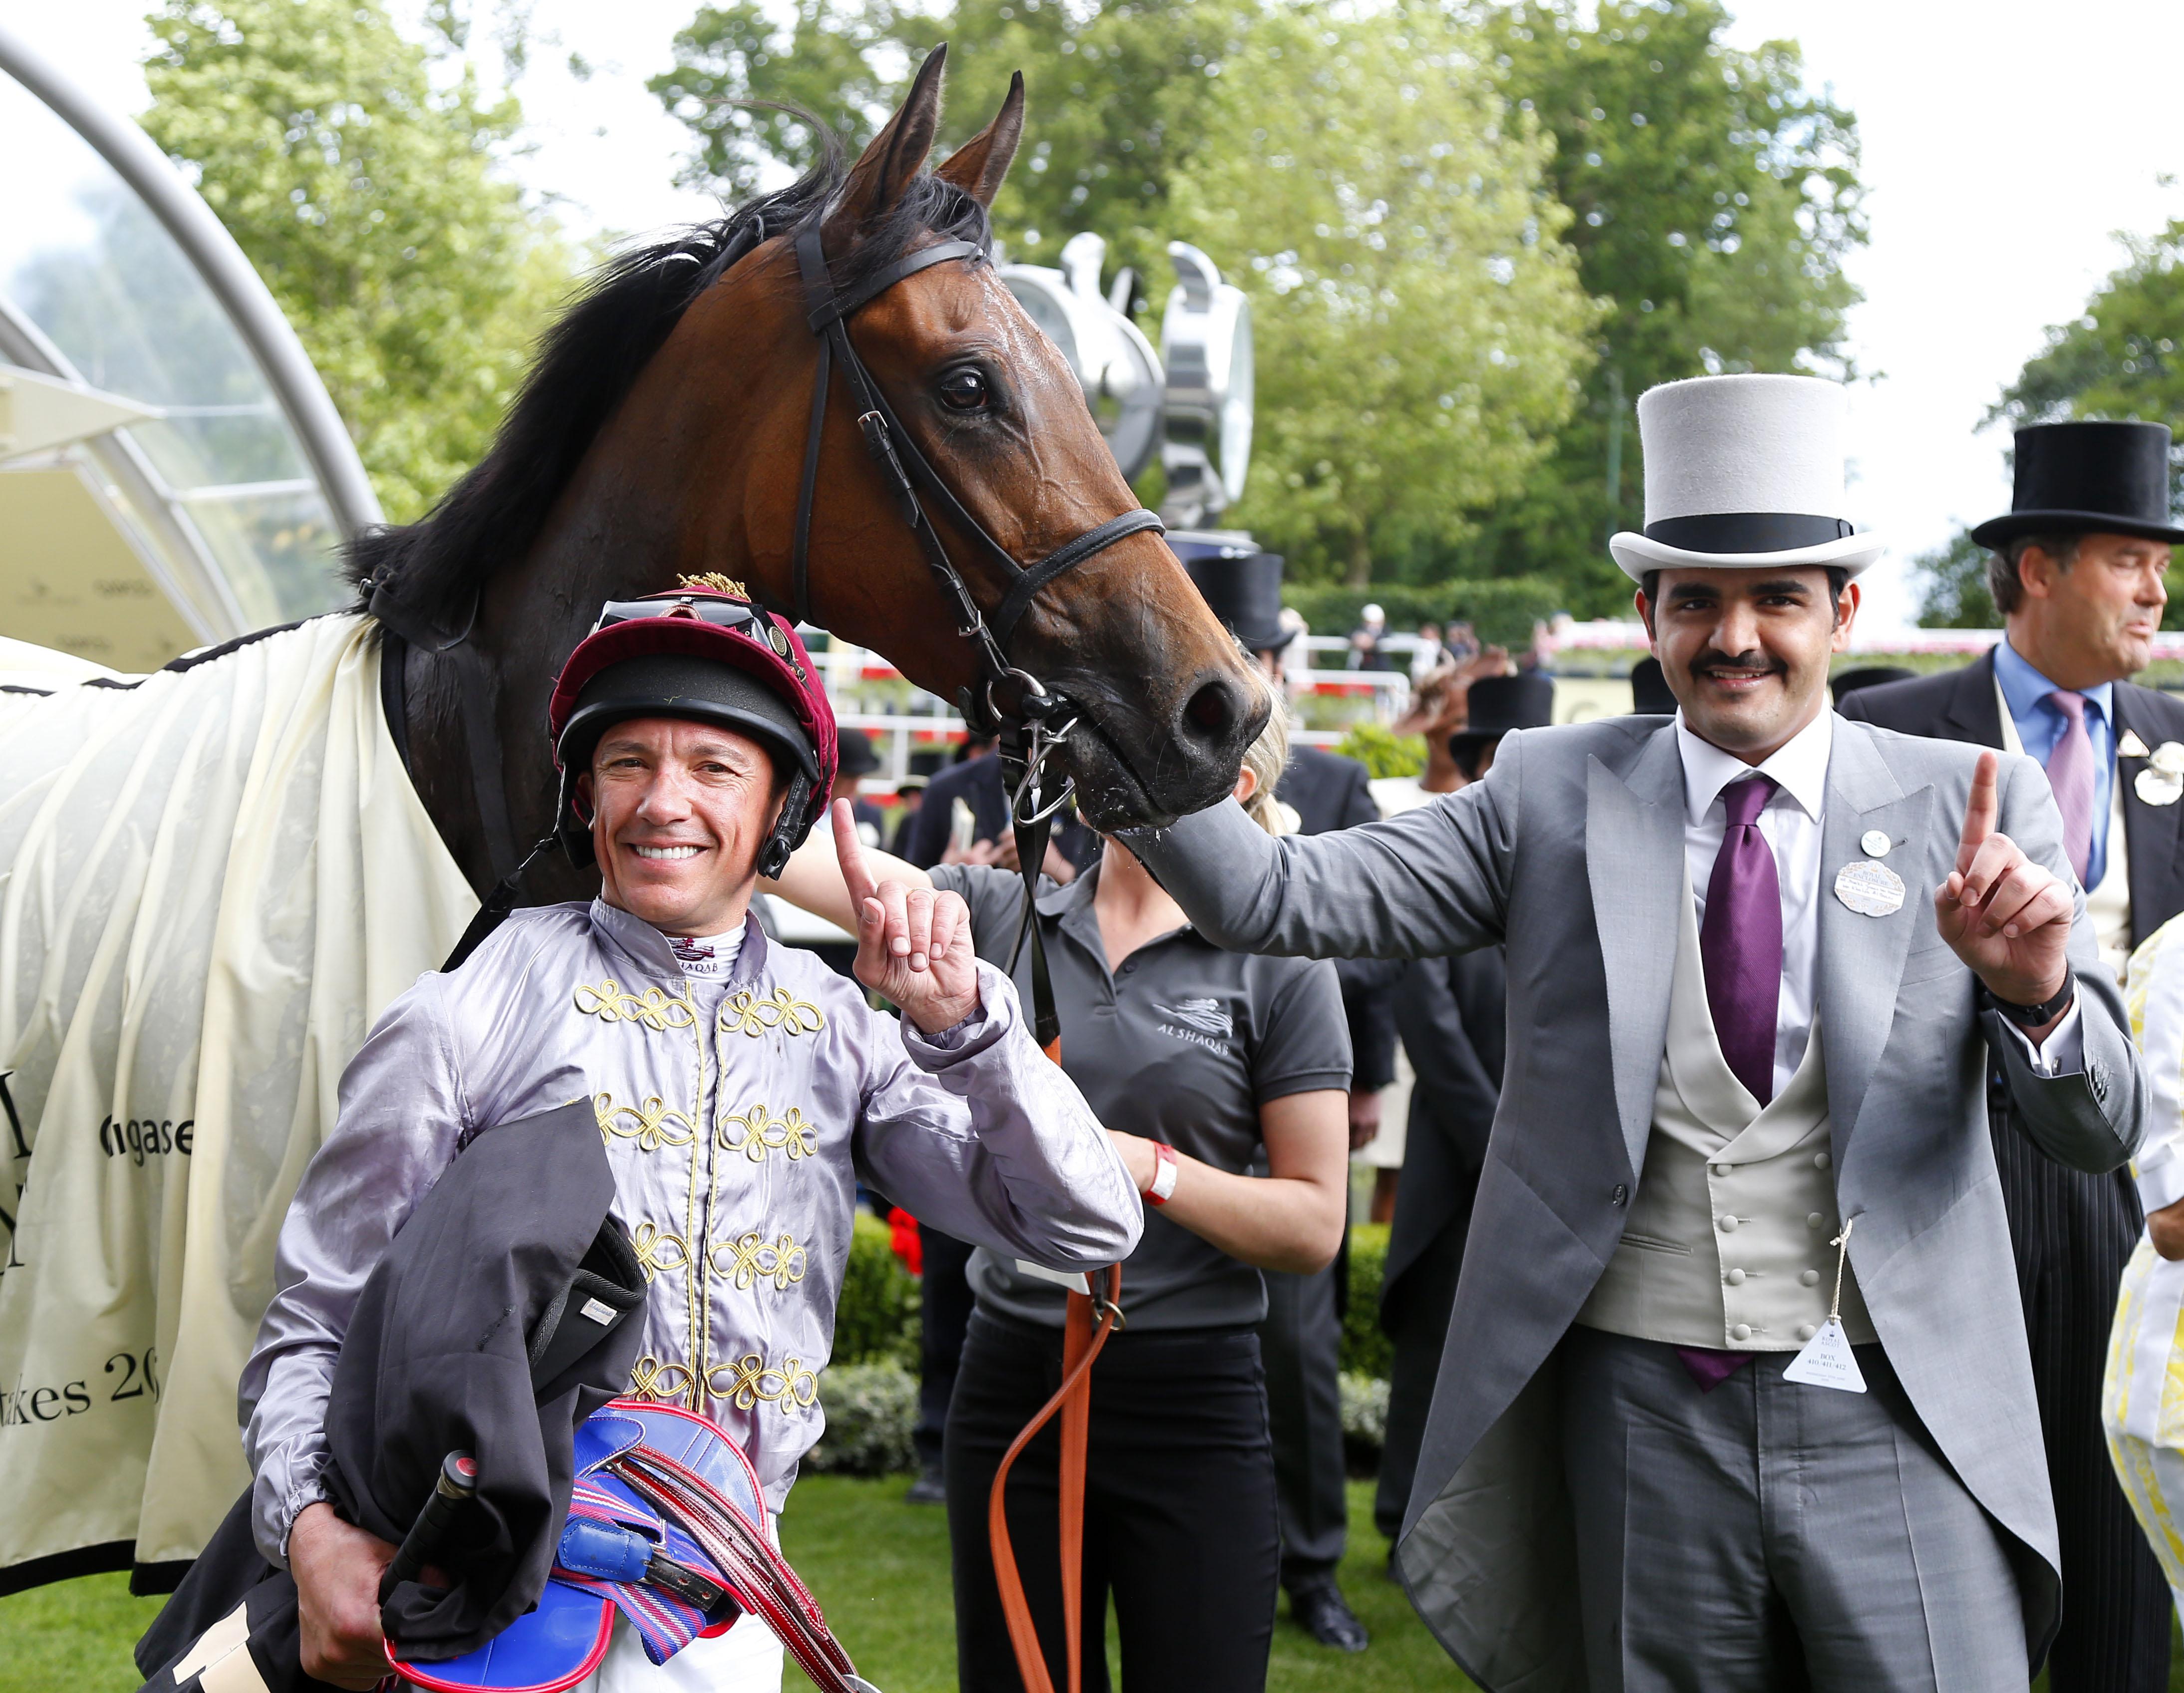 Royal Ascot 2015 Frankie Dettori Rides 50th Winner At